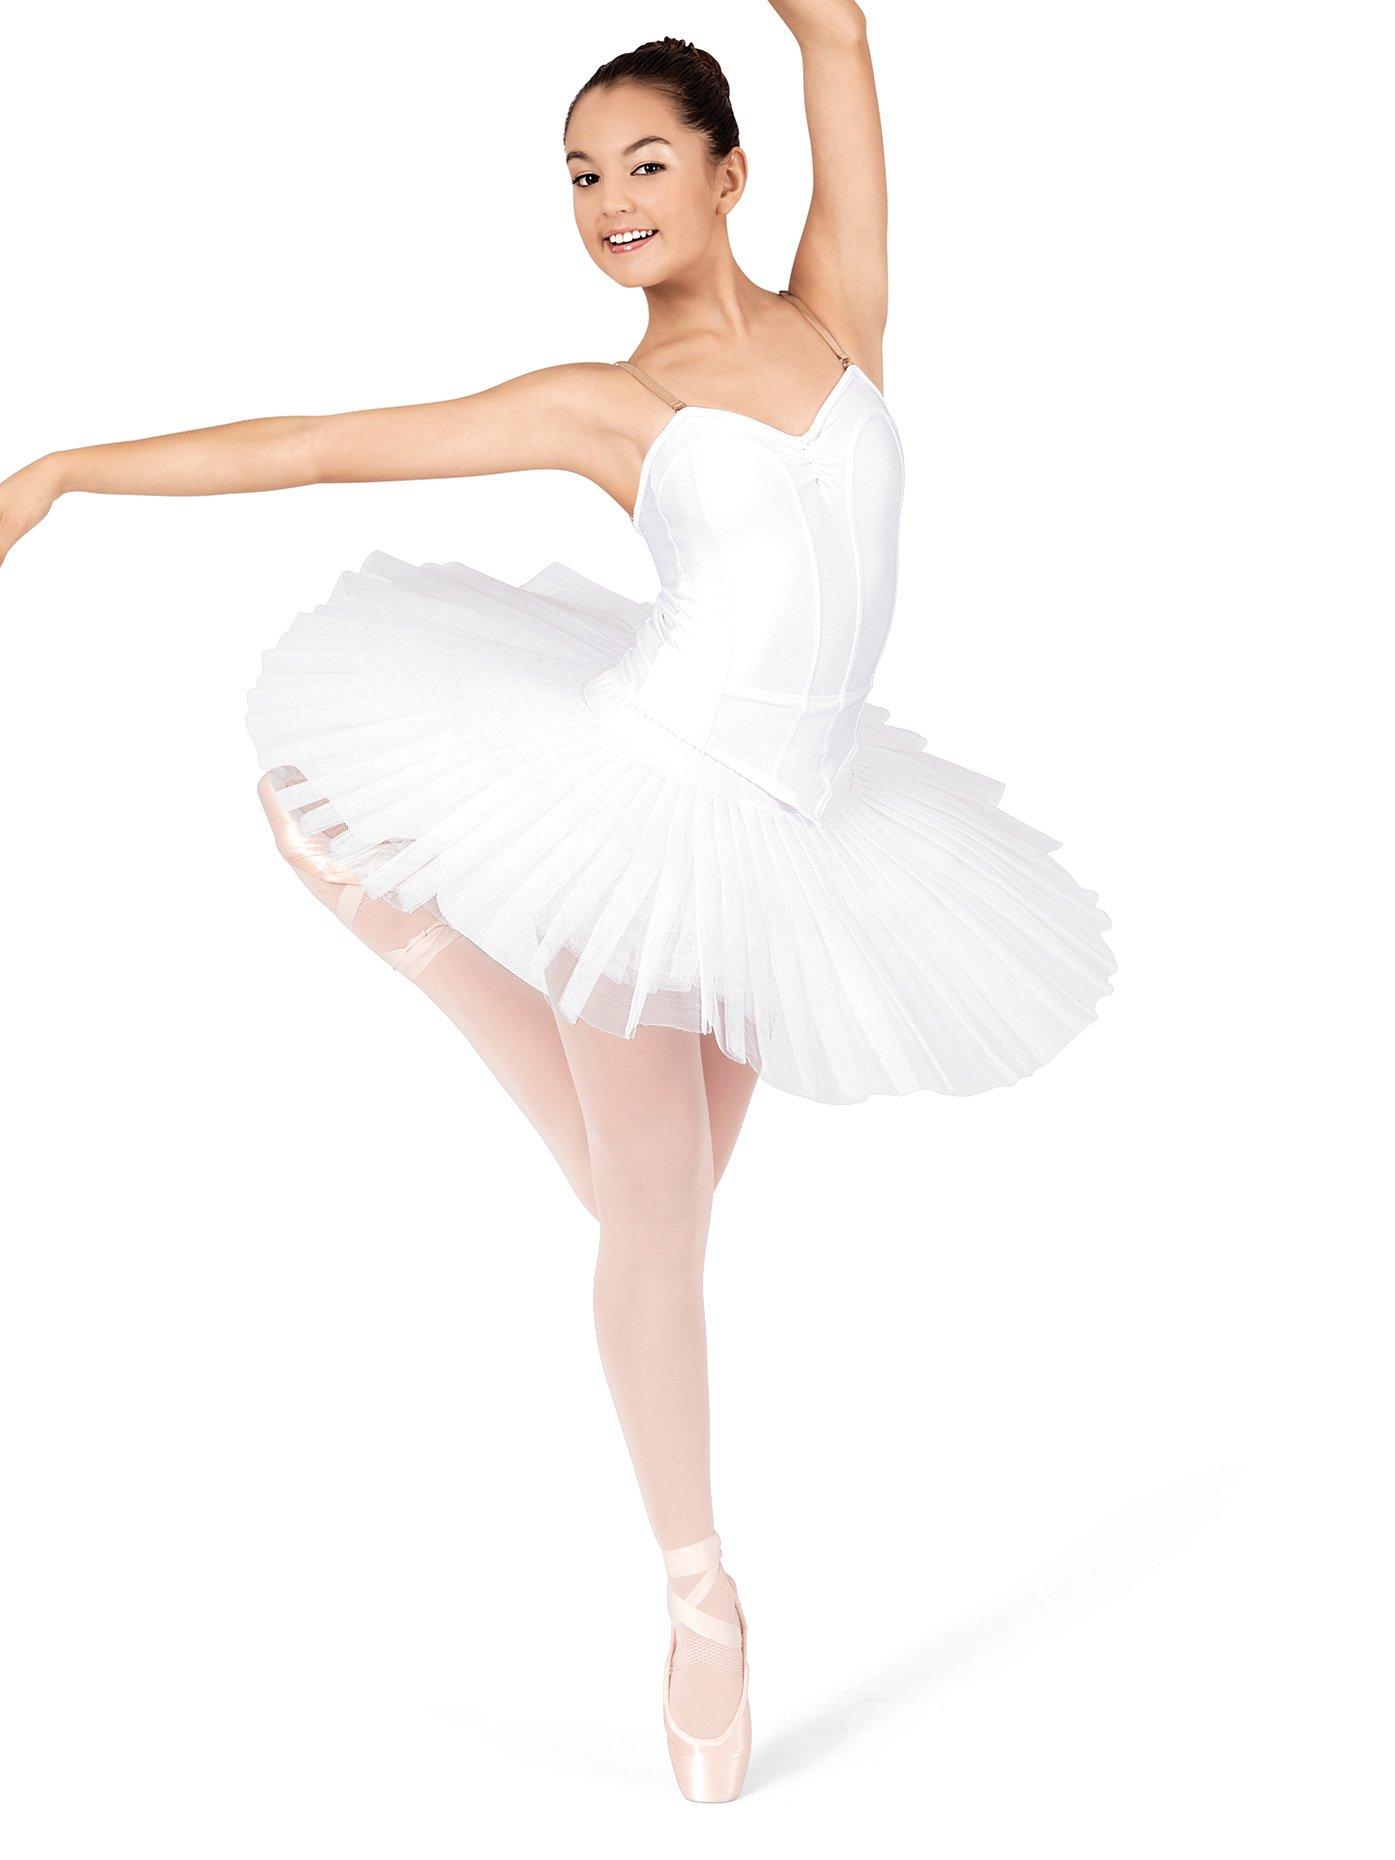 Natalie Dancewear Adult/Child Professional Tutu,N5835WHTLXL,White,LXL by Natalie Dancewear